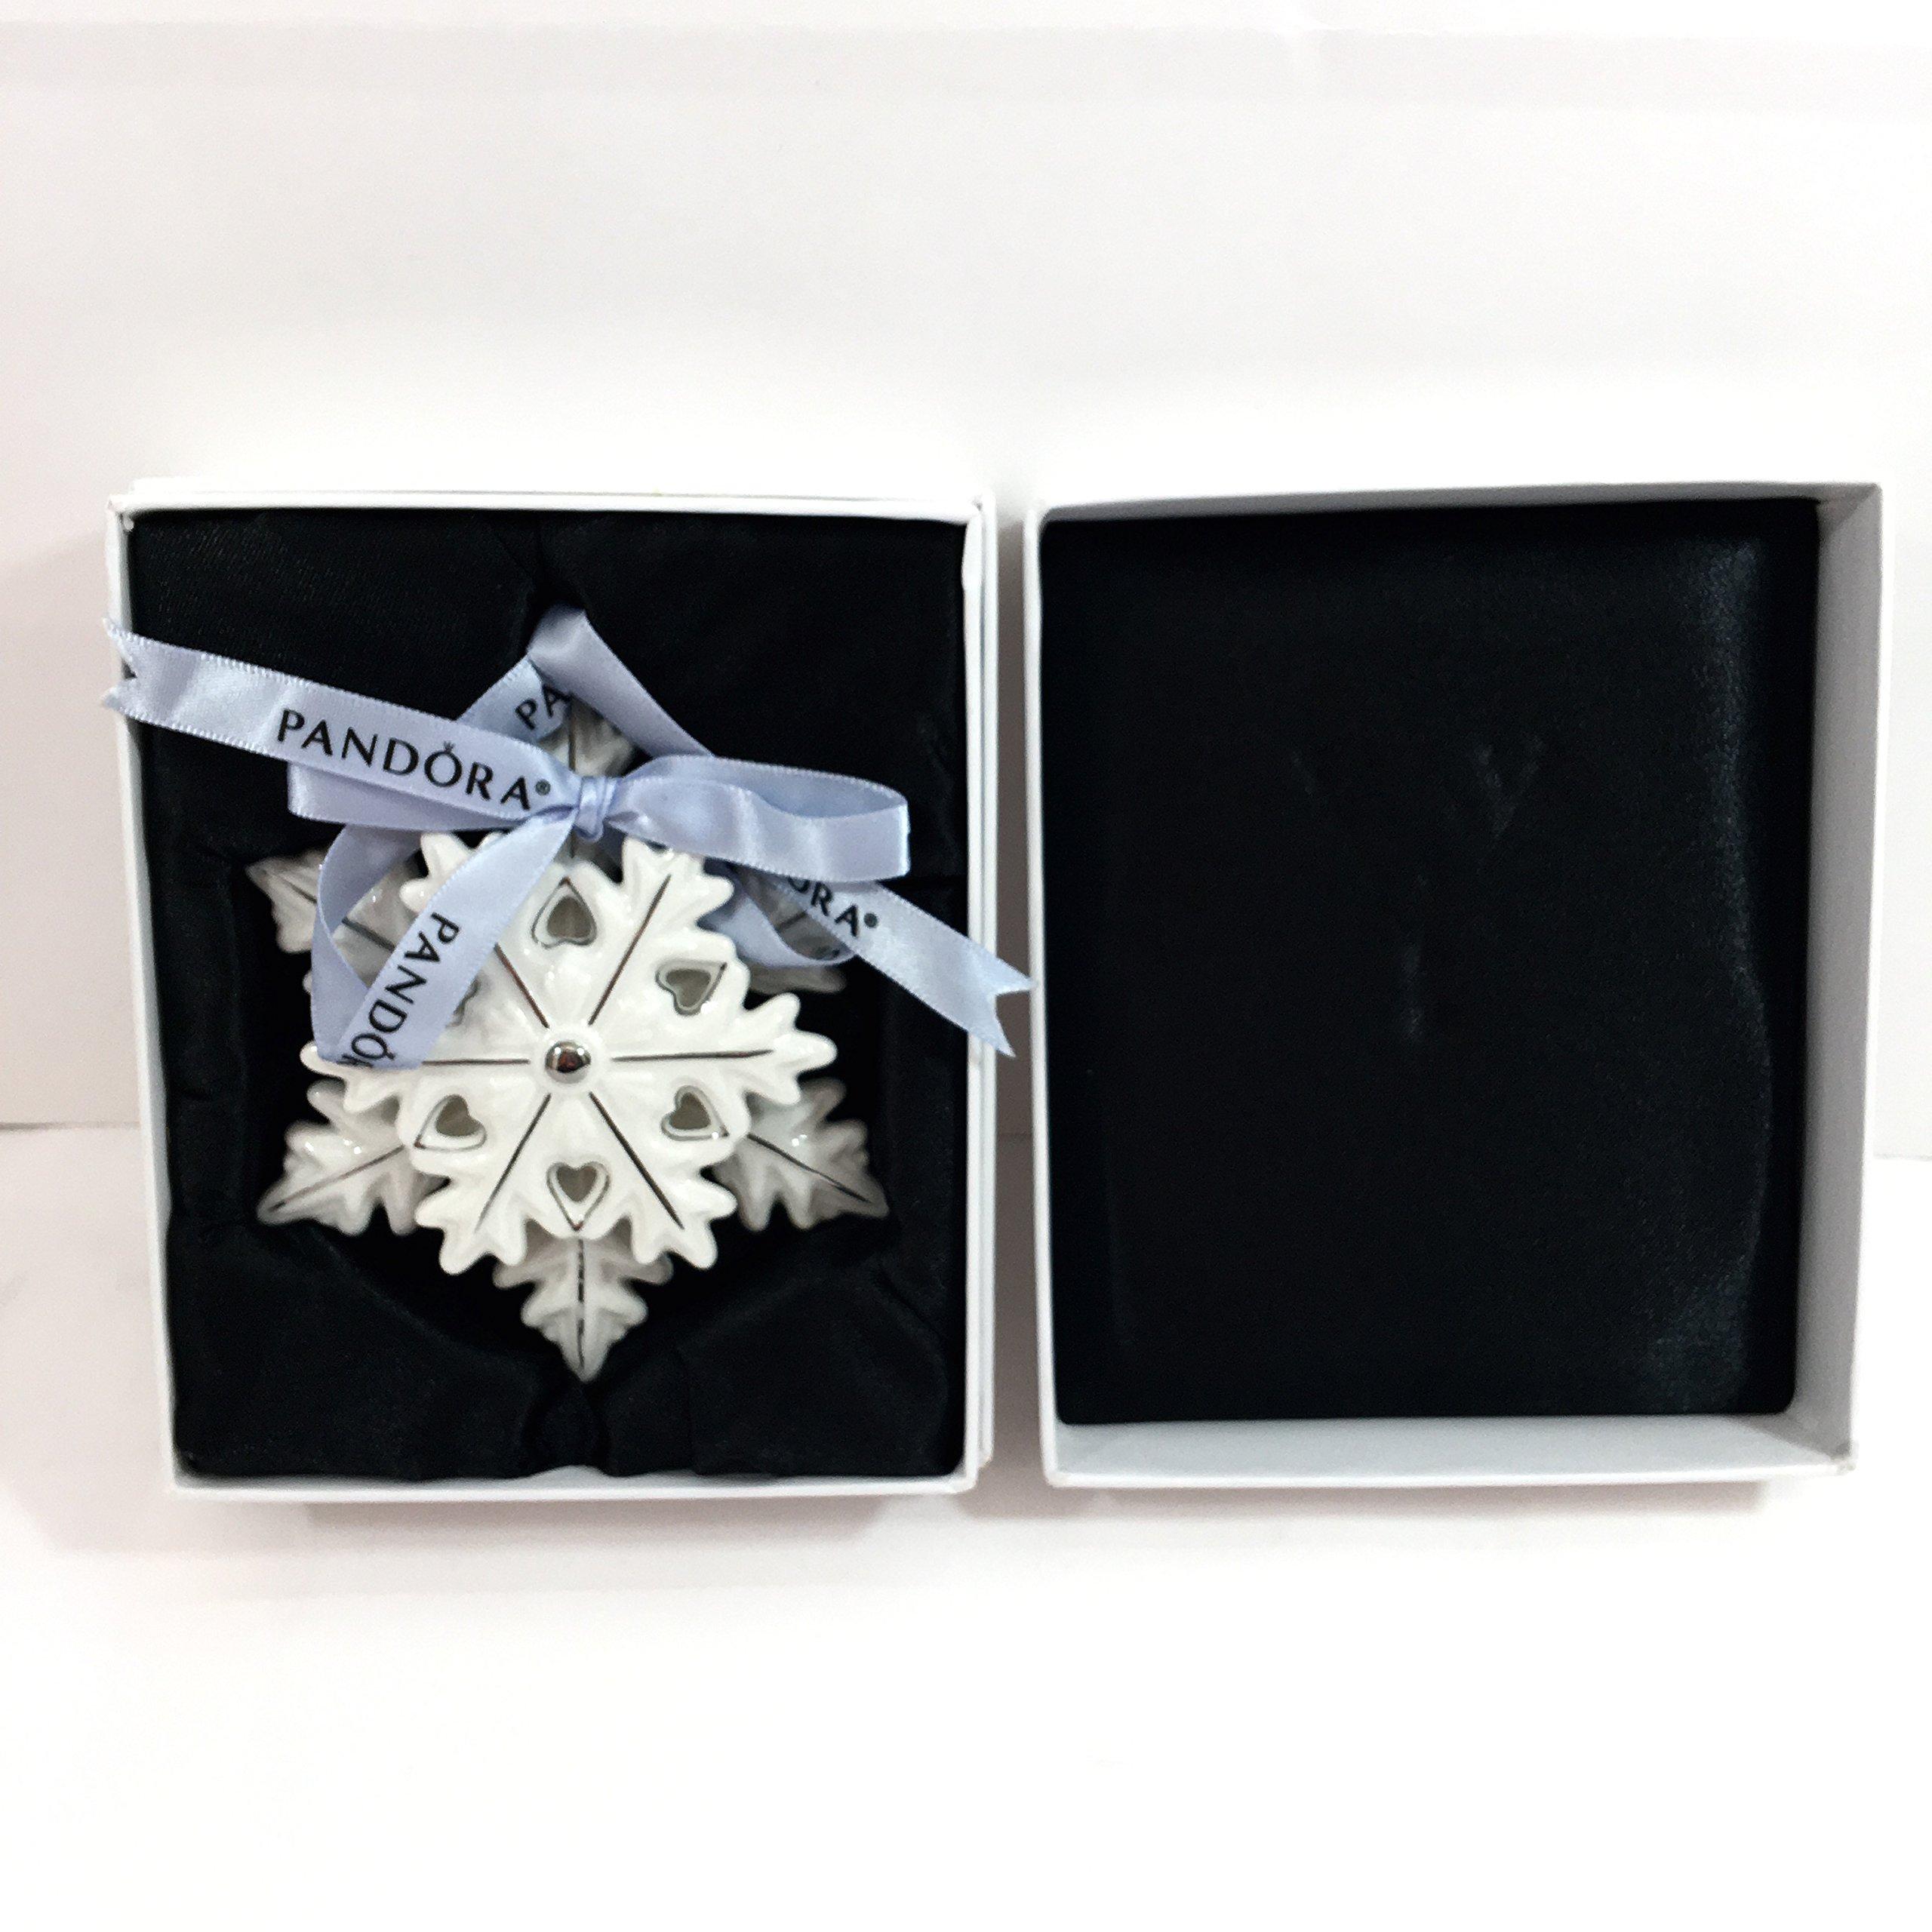 PANDORA SNOWFLAKE Collector 2015 Christmas Ornament Limited Edition w Box PUSP002